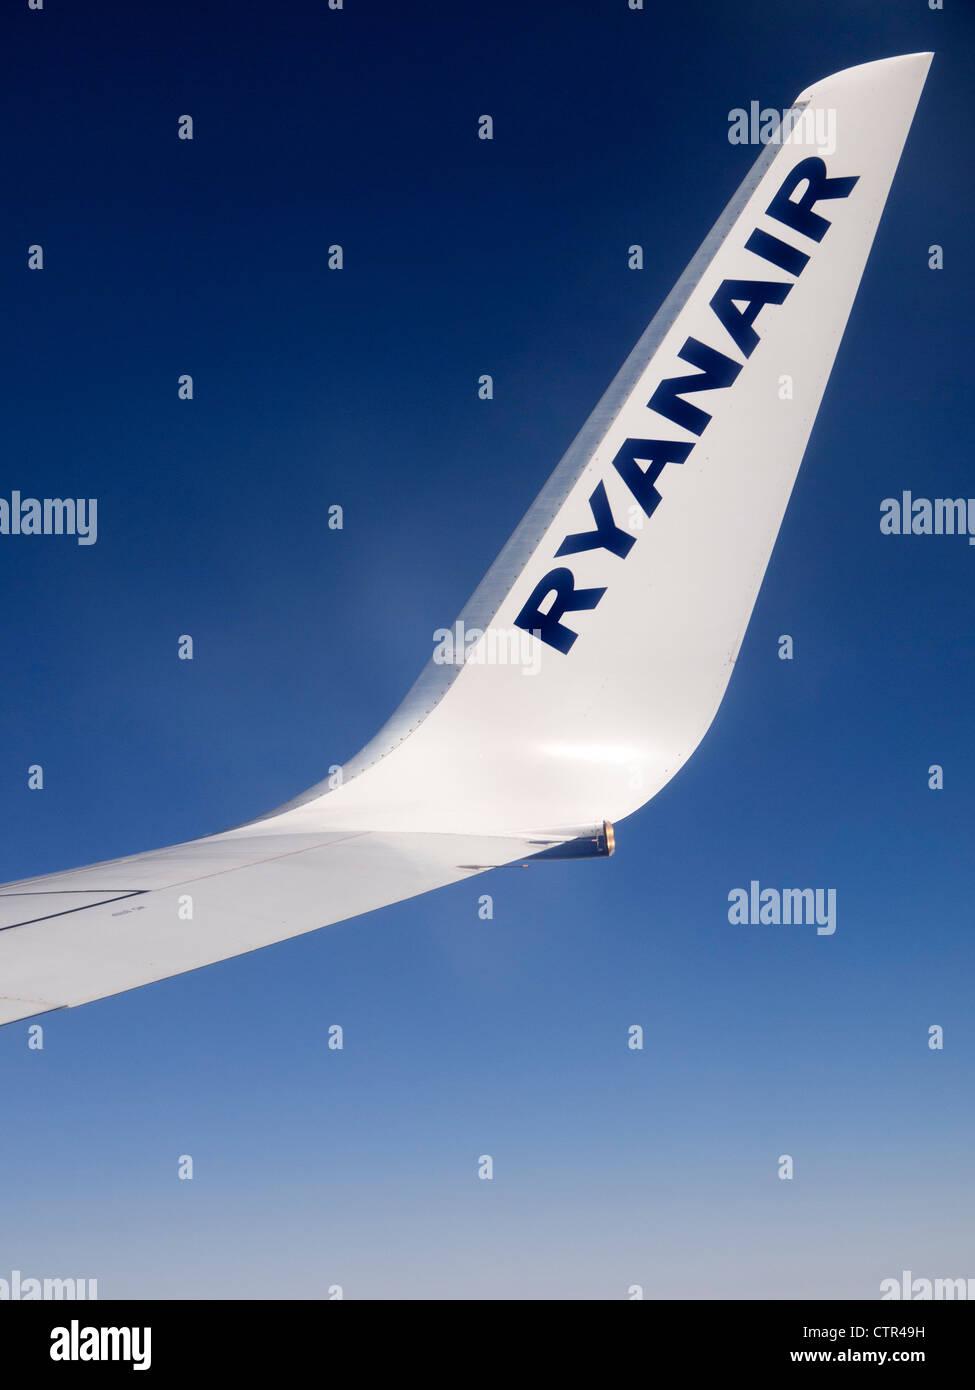 Ryanair airplane wing - Stock Image